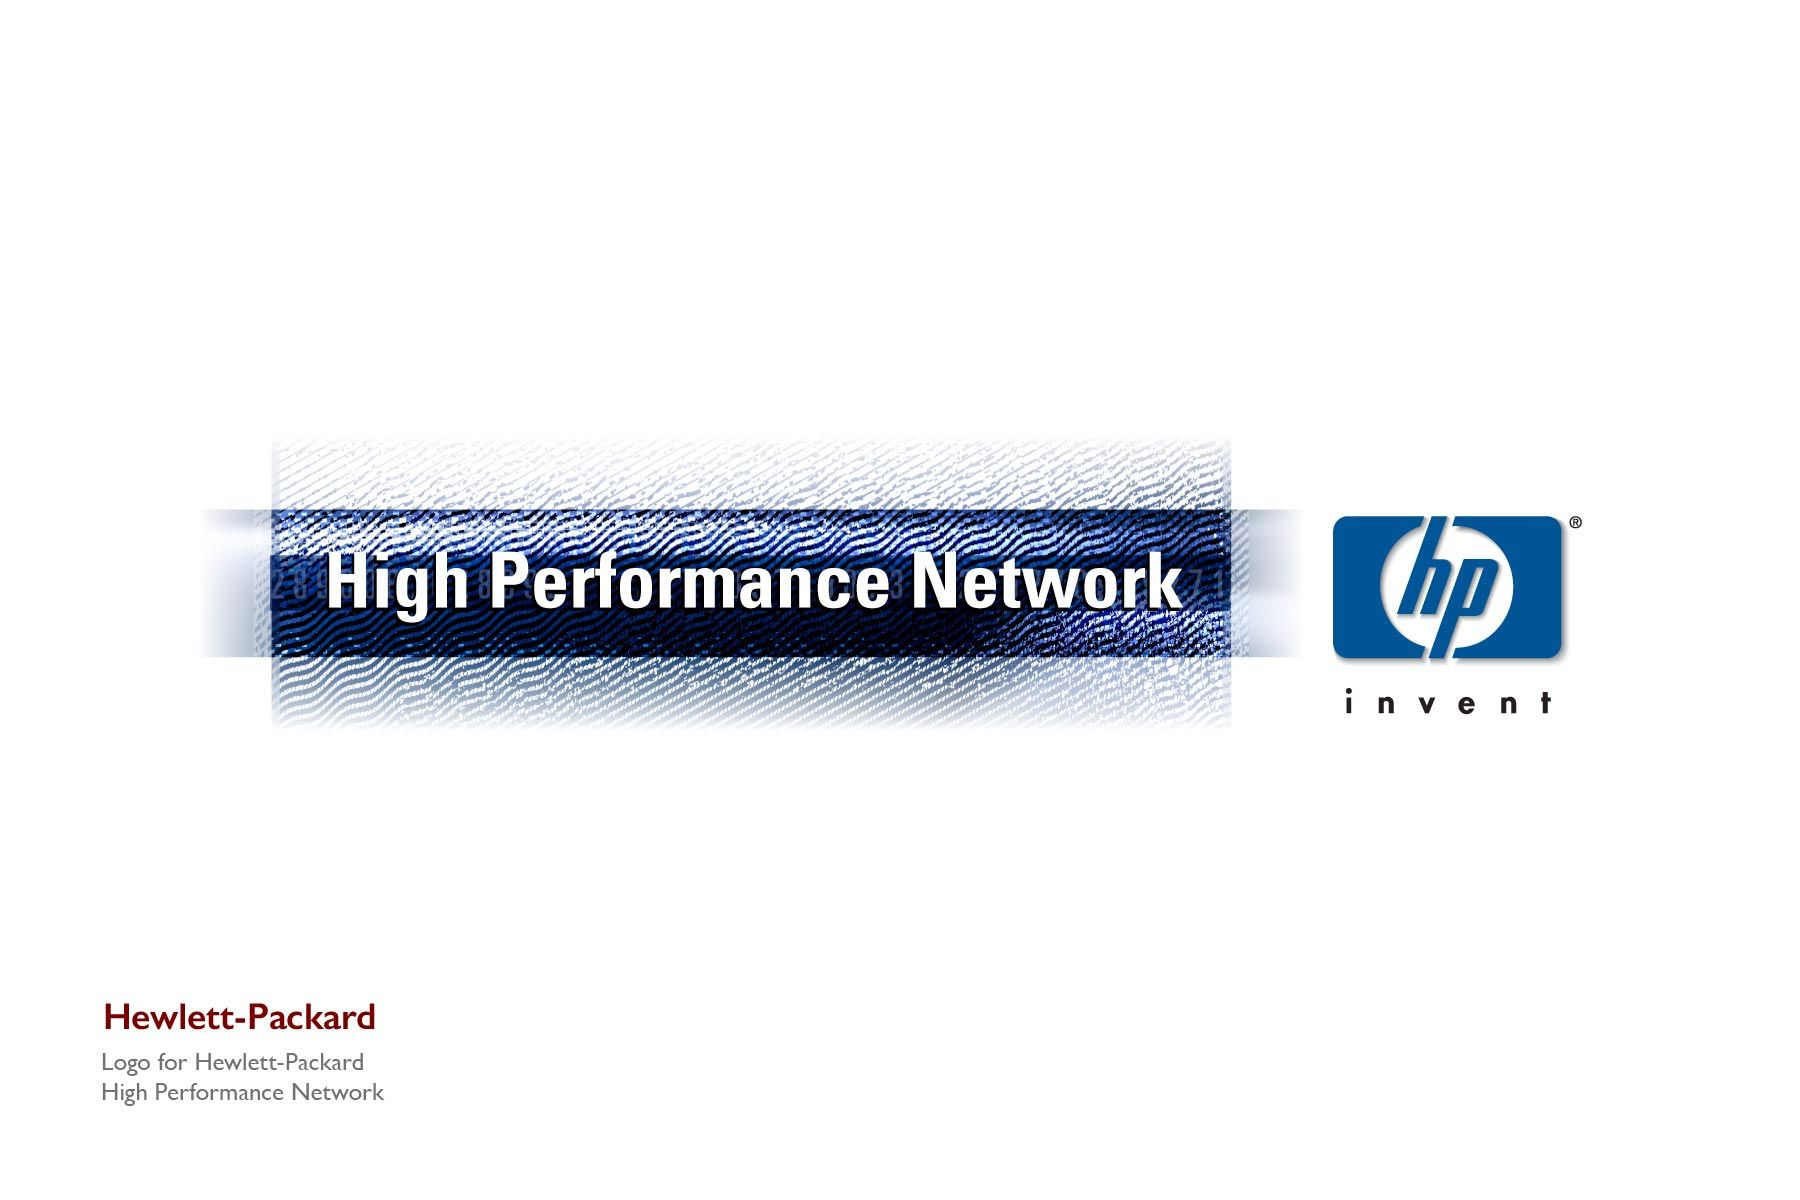 HP High Performance Network